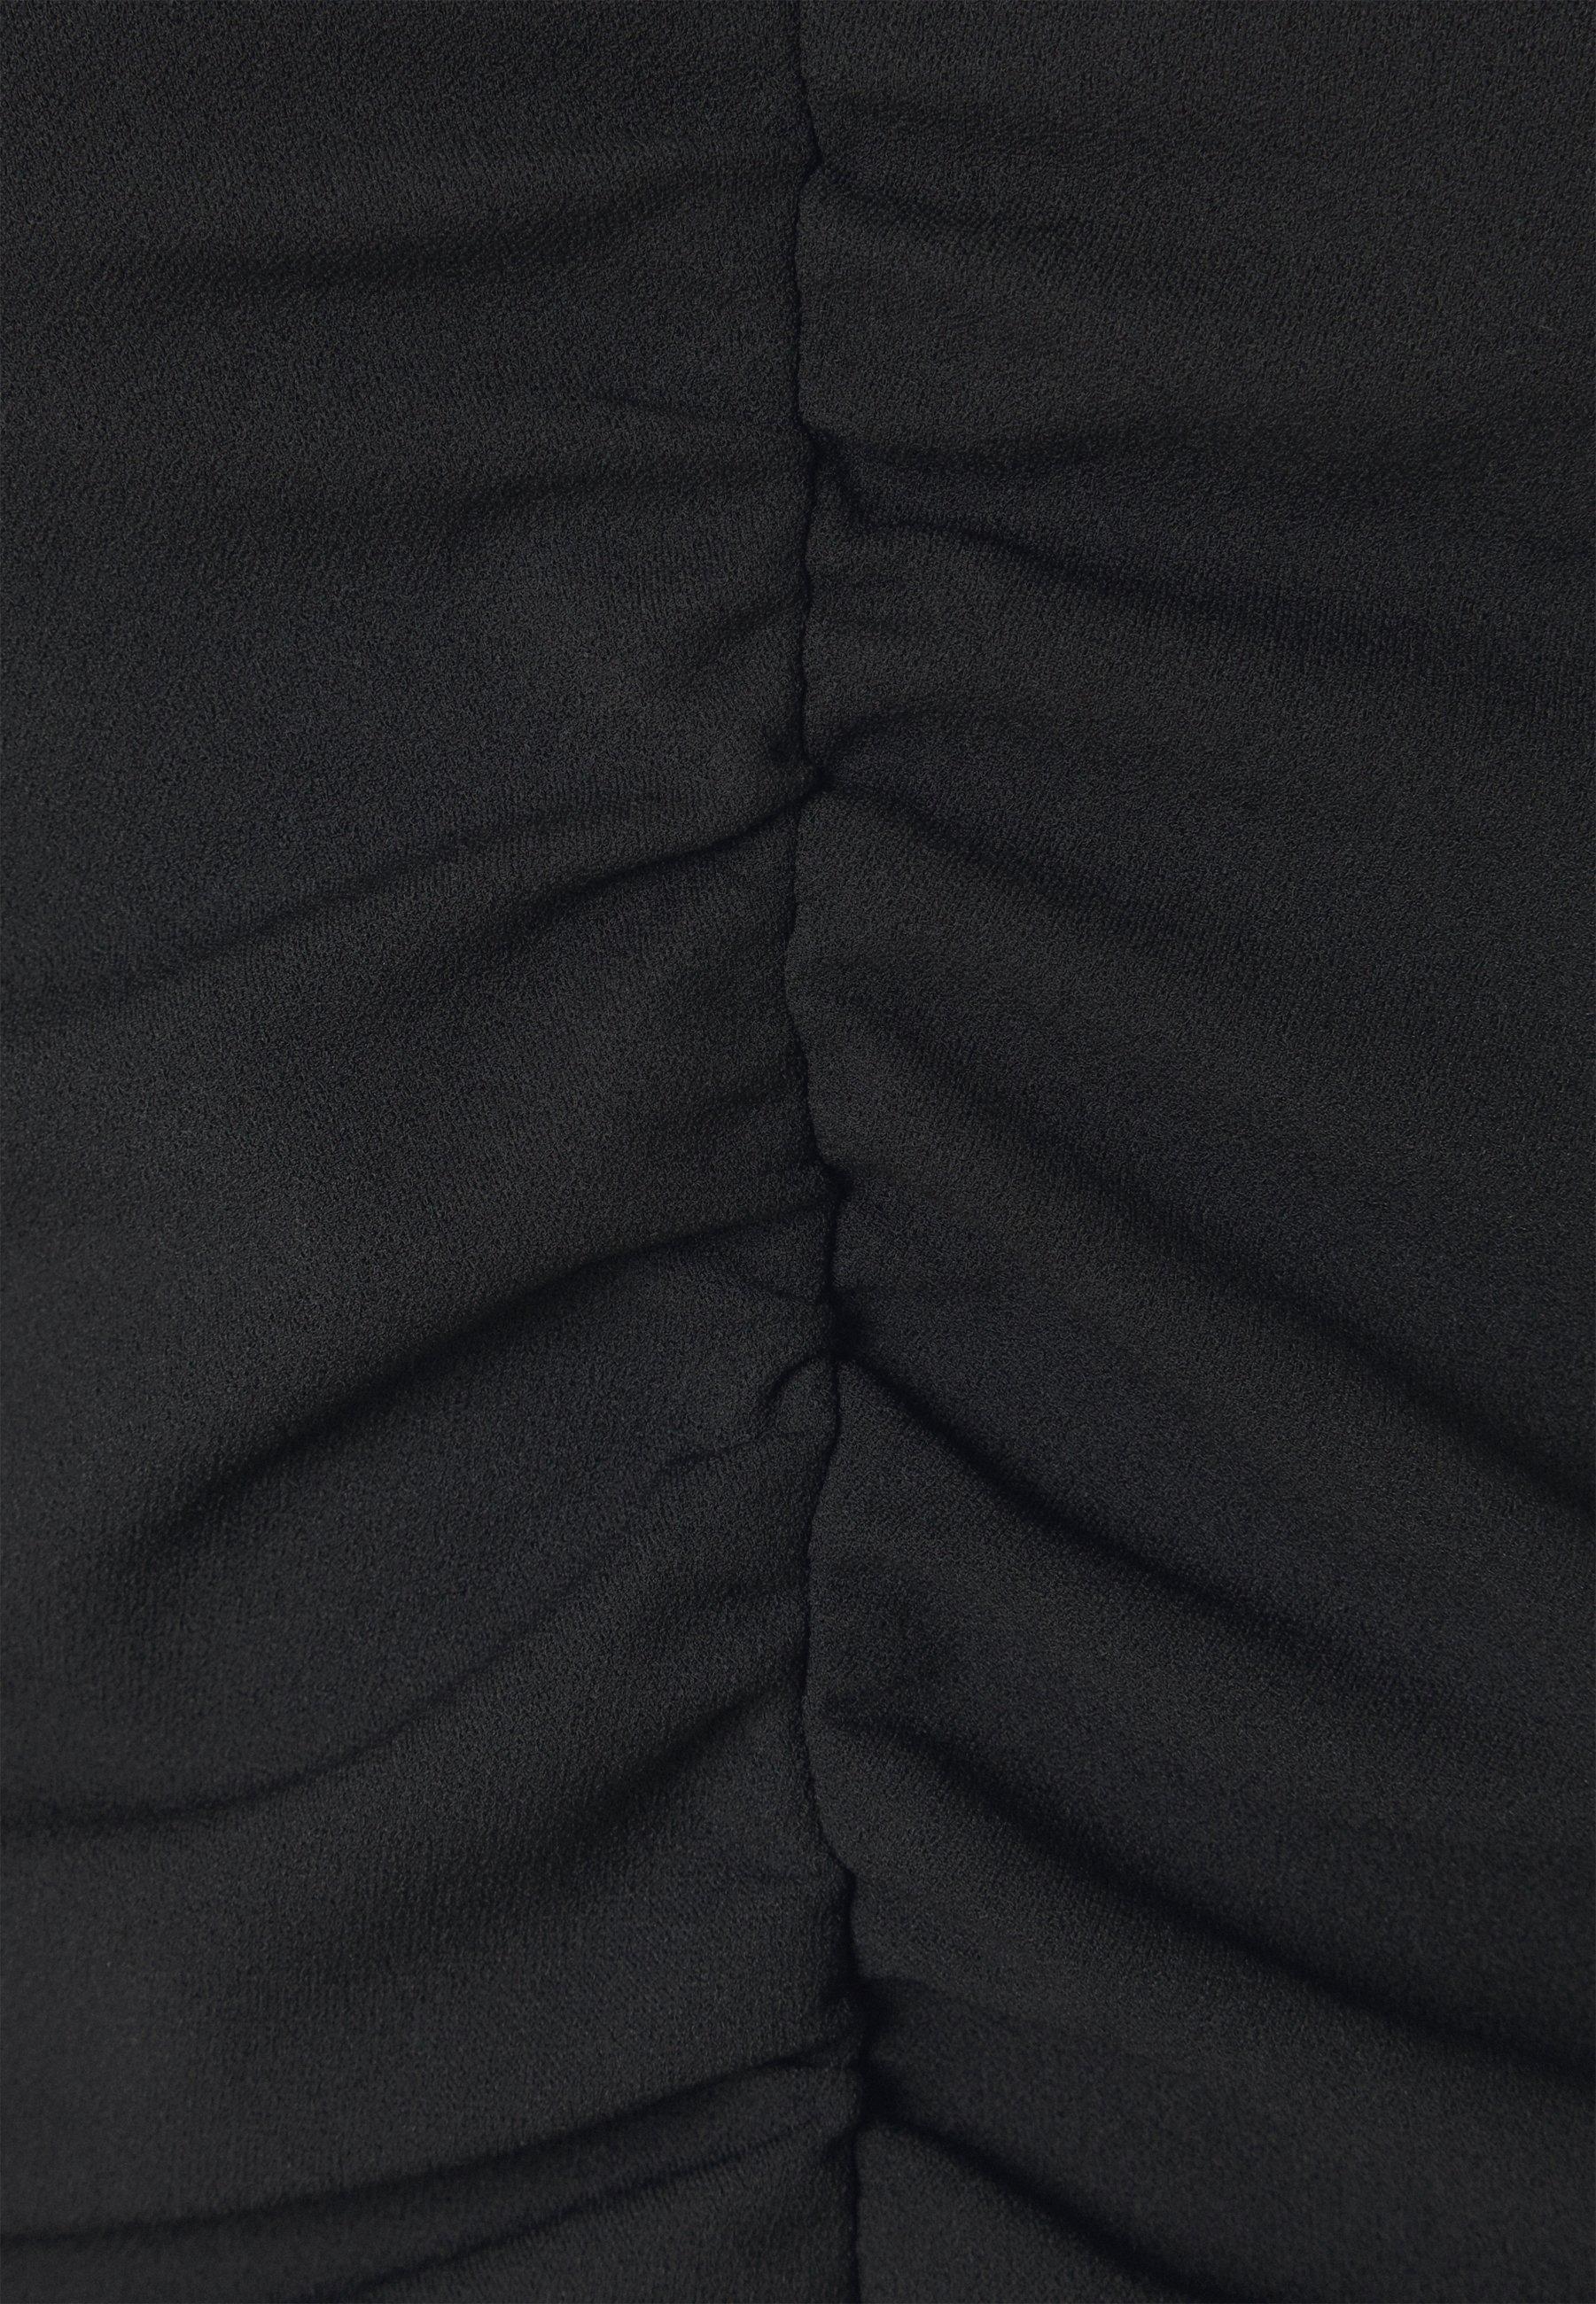 Pieces Pcdubaine Top - Bluser Black/svart